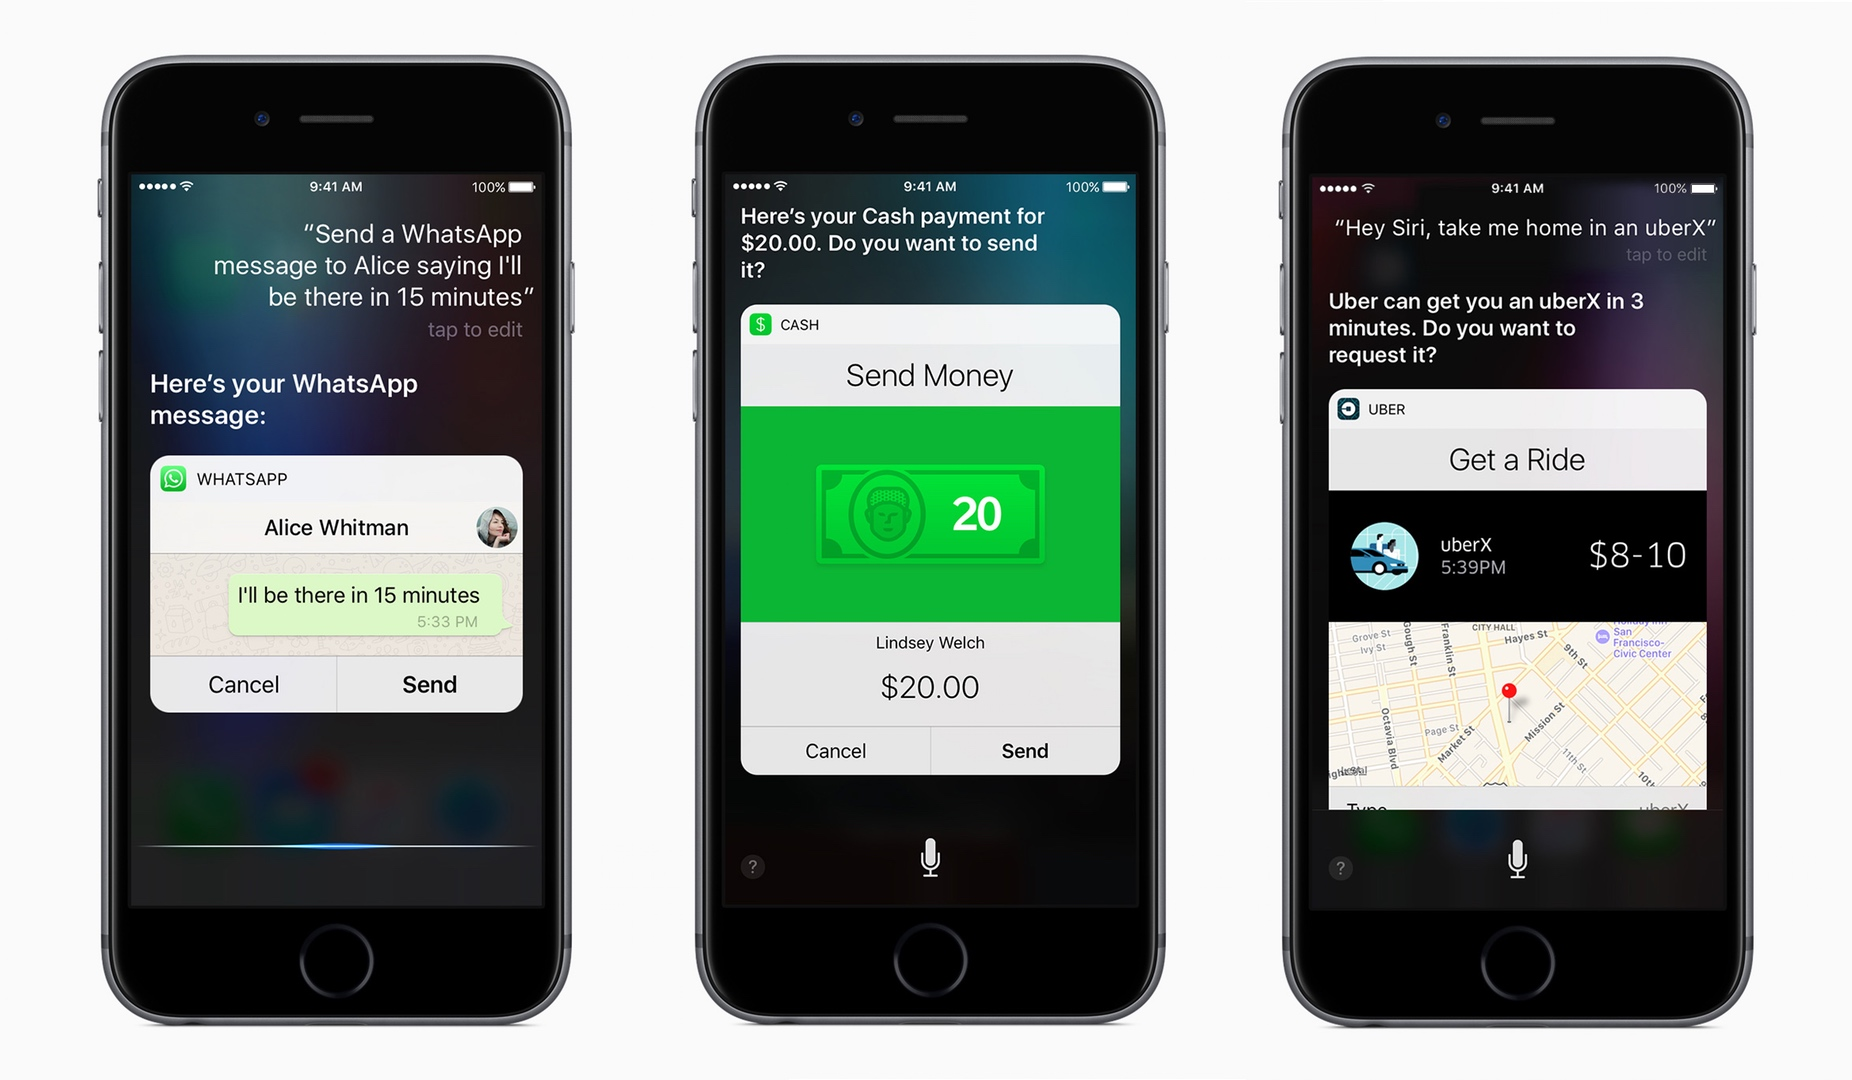 siri ios Everything new in iOS 10 New